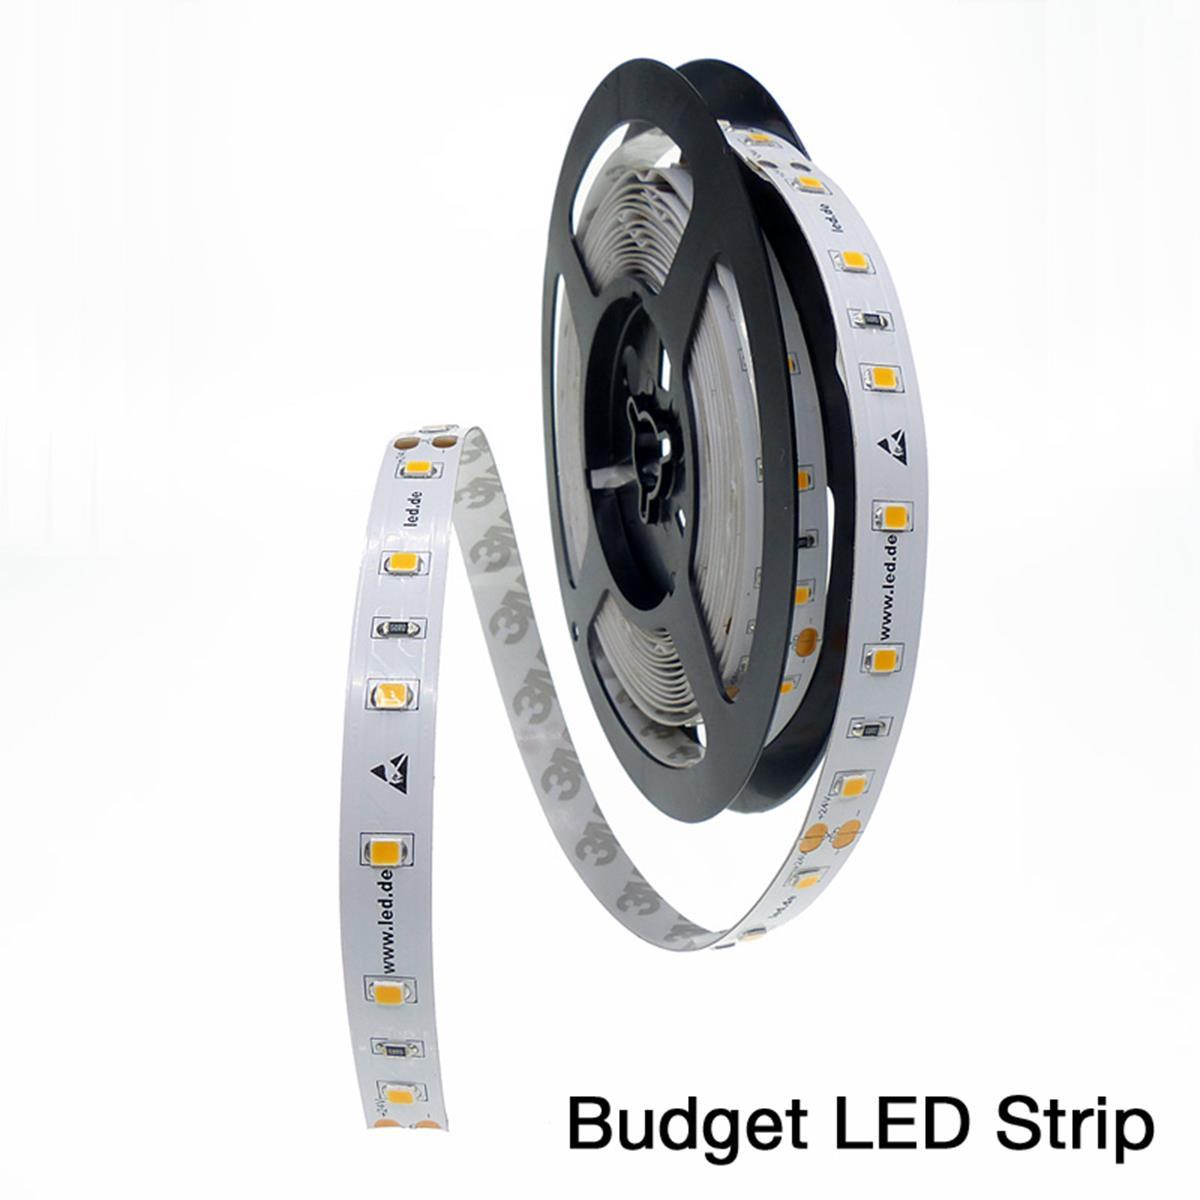 led strip leiste low budget warmwei 3000 kelvin 300 led 5m 70 ra 5m rolle ebay. Black Bedroom Furniture Sets. Home Design Ideas